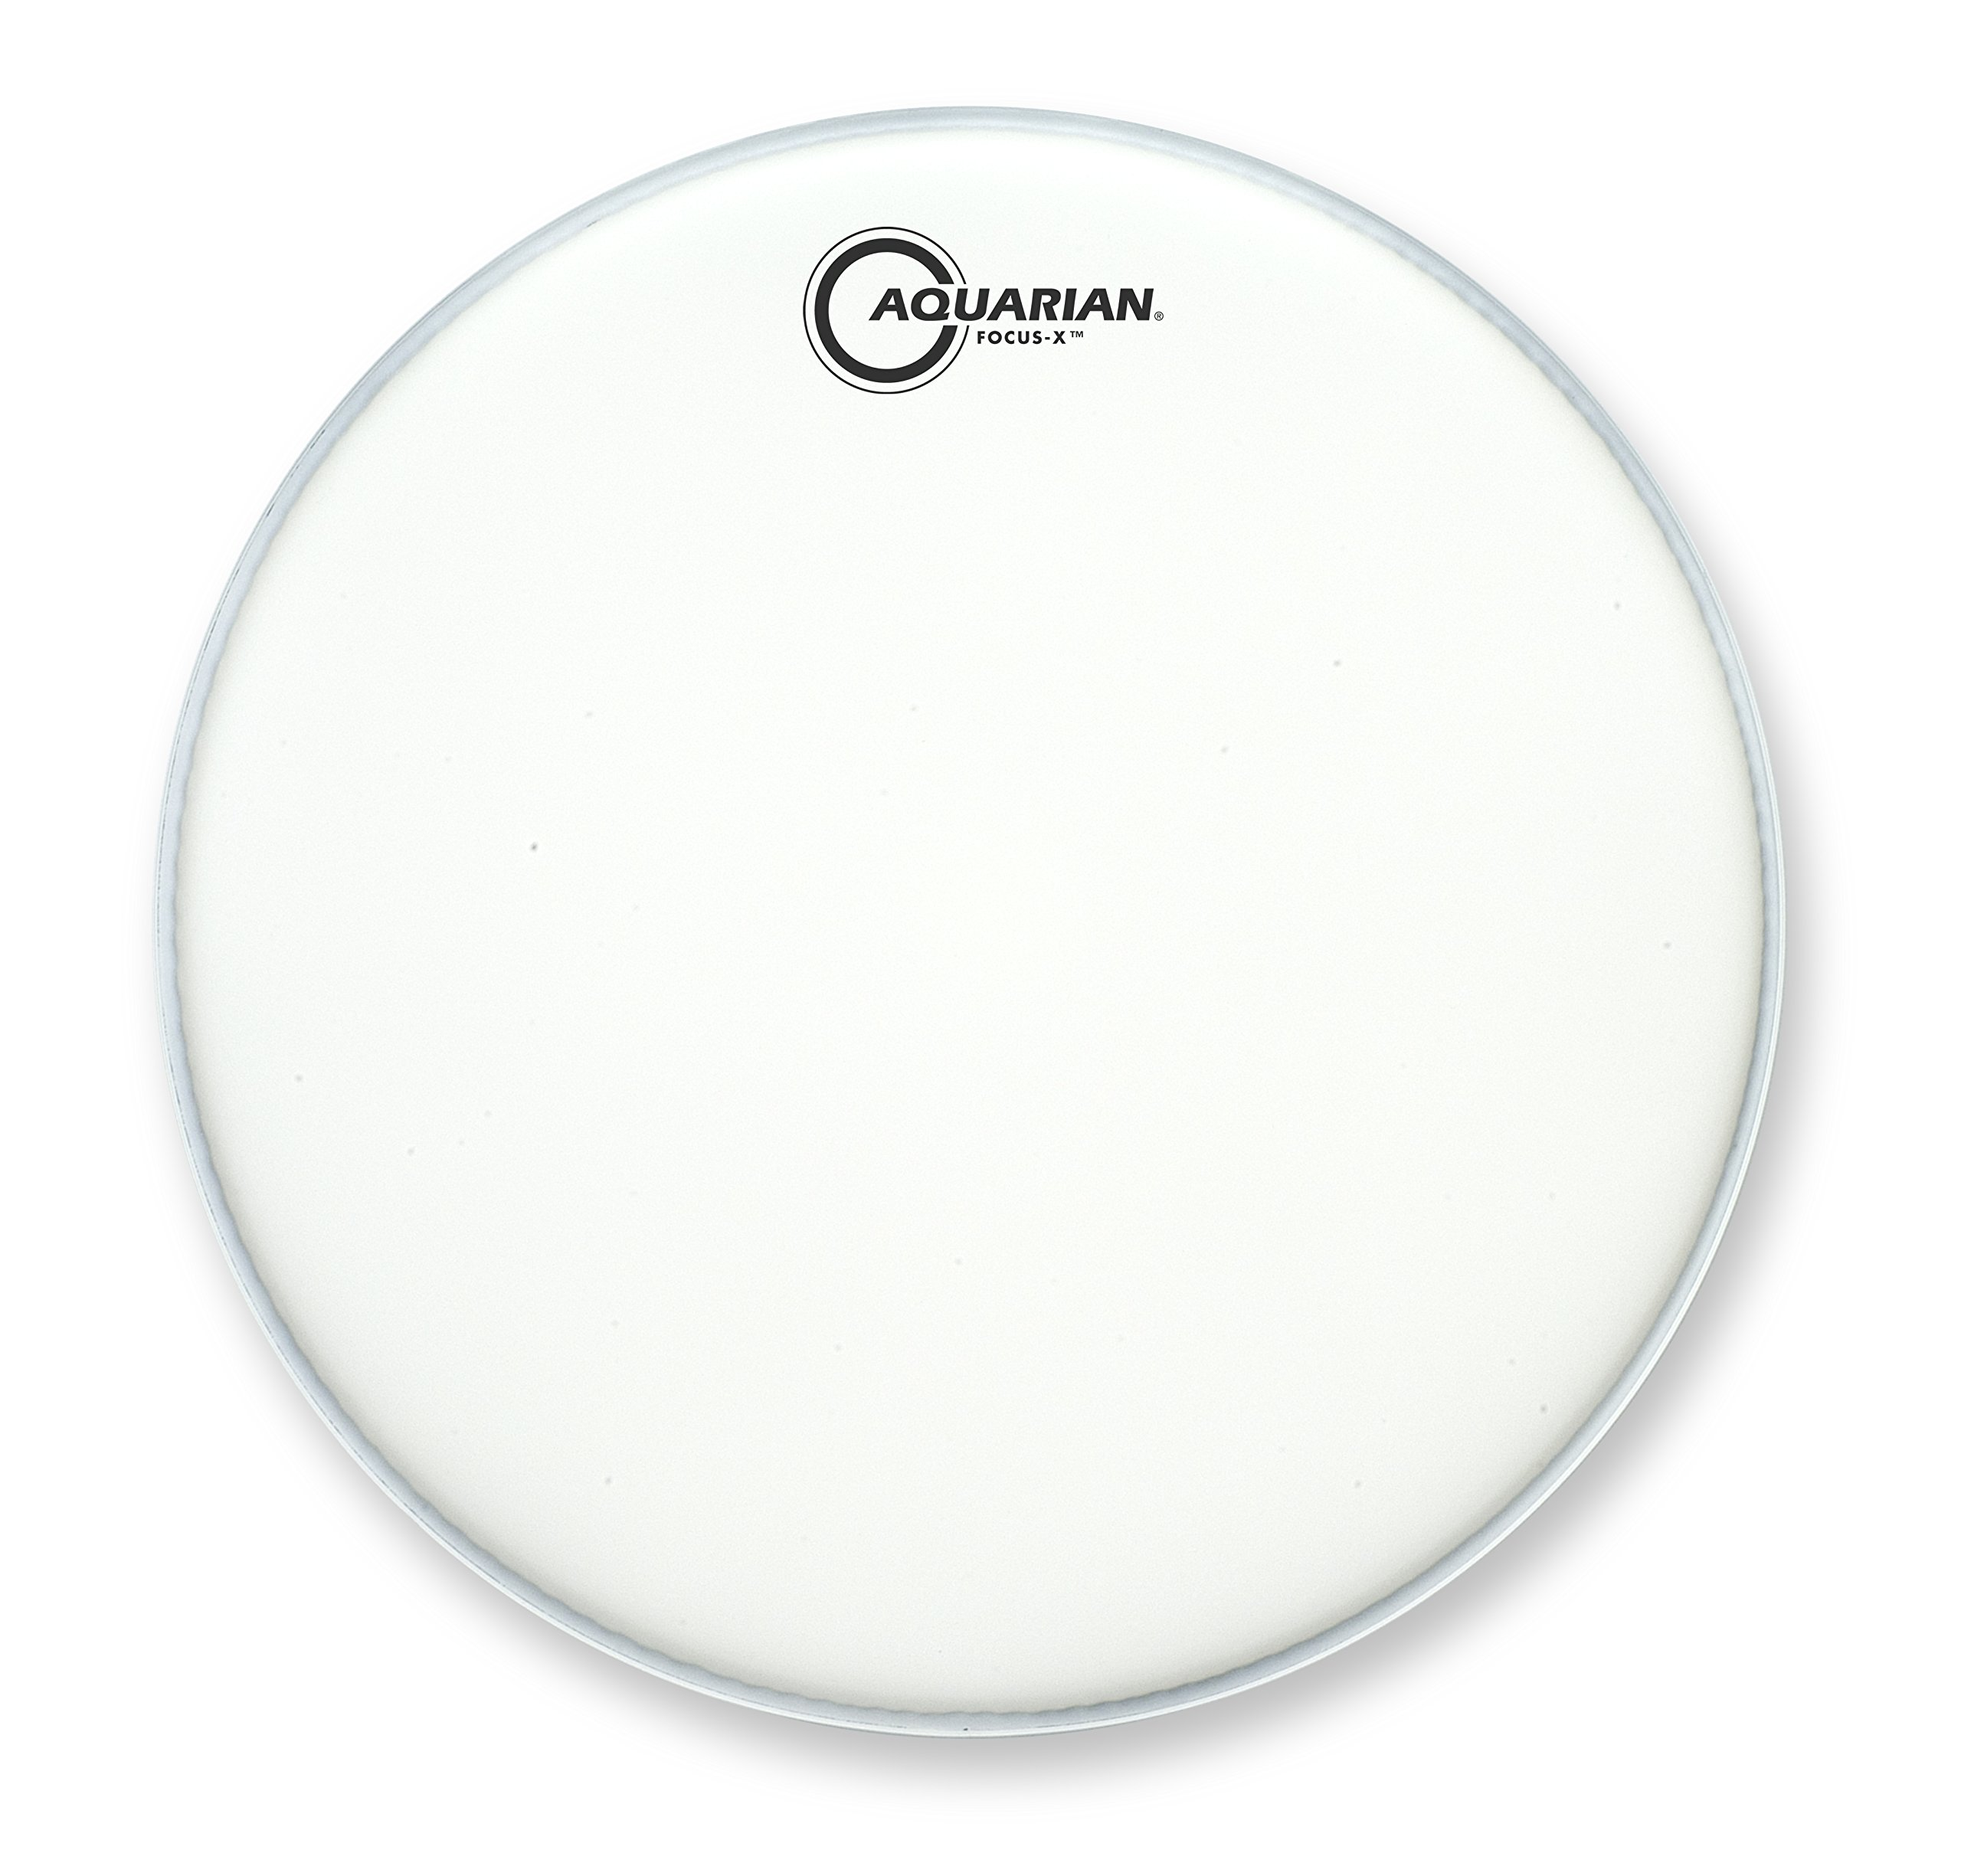 Aquarian Drumheads Drumhead Pack (TCFXPD13) by Aquarian Drumheads